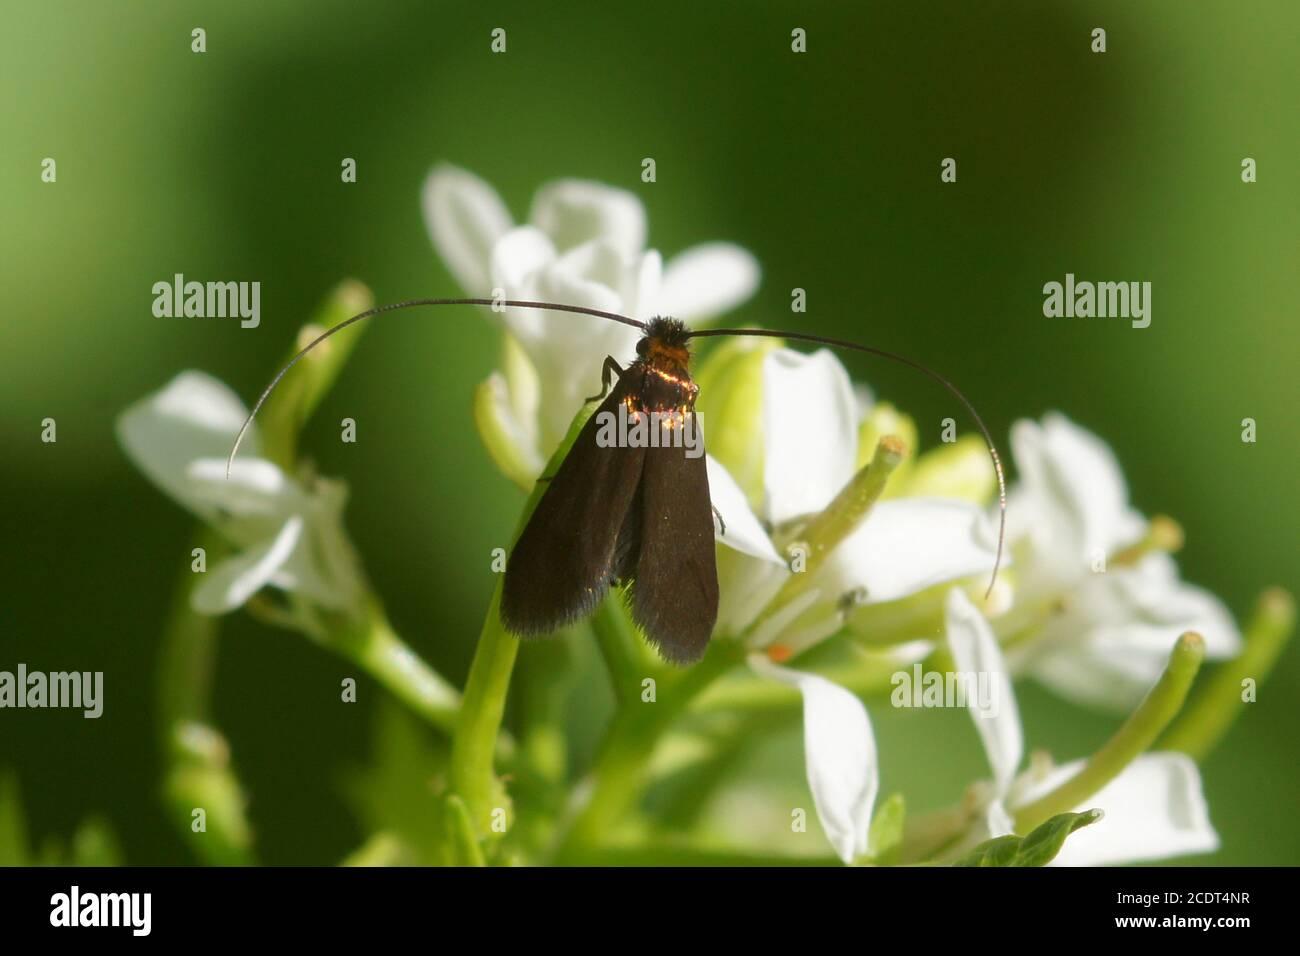 Longhorn moth Cauchas rufimitrella of the family Adelidae on the flowers of garlic mustard (Alliaria petiolata), family Brassicaceae, Cruciferae. Stock Photo